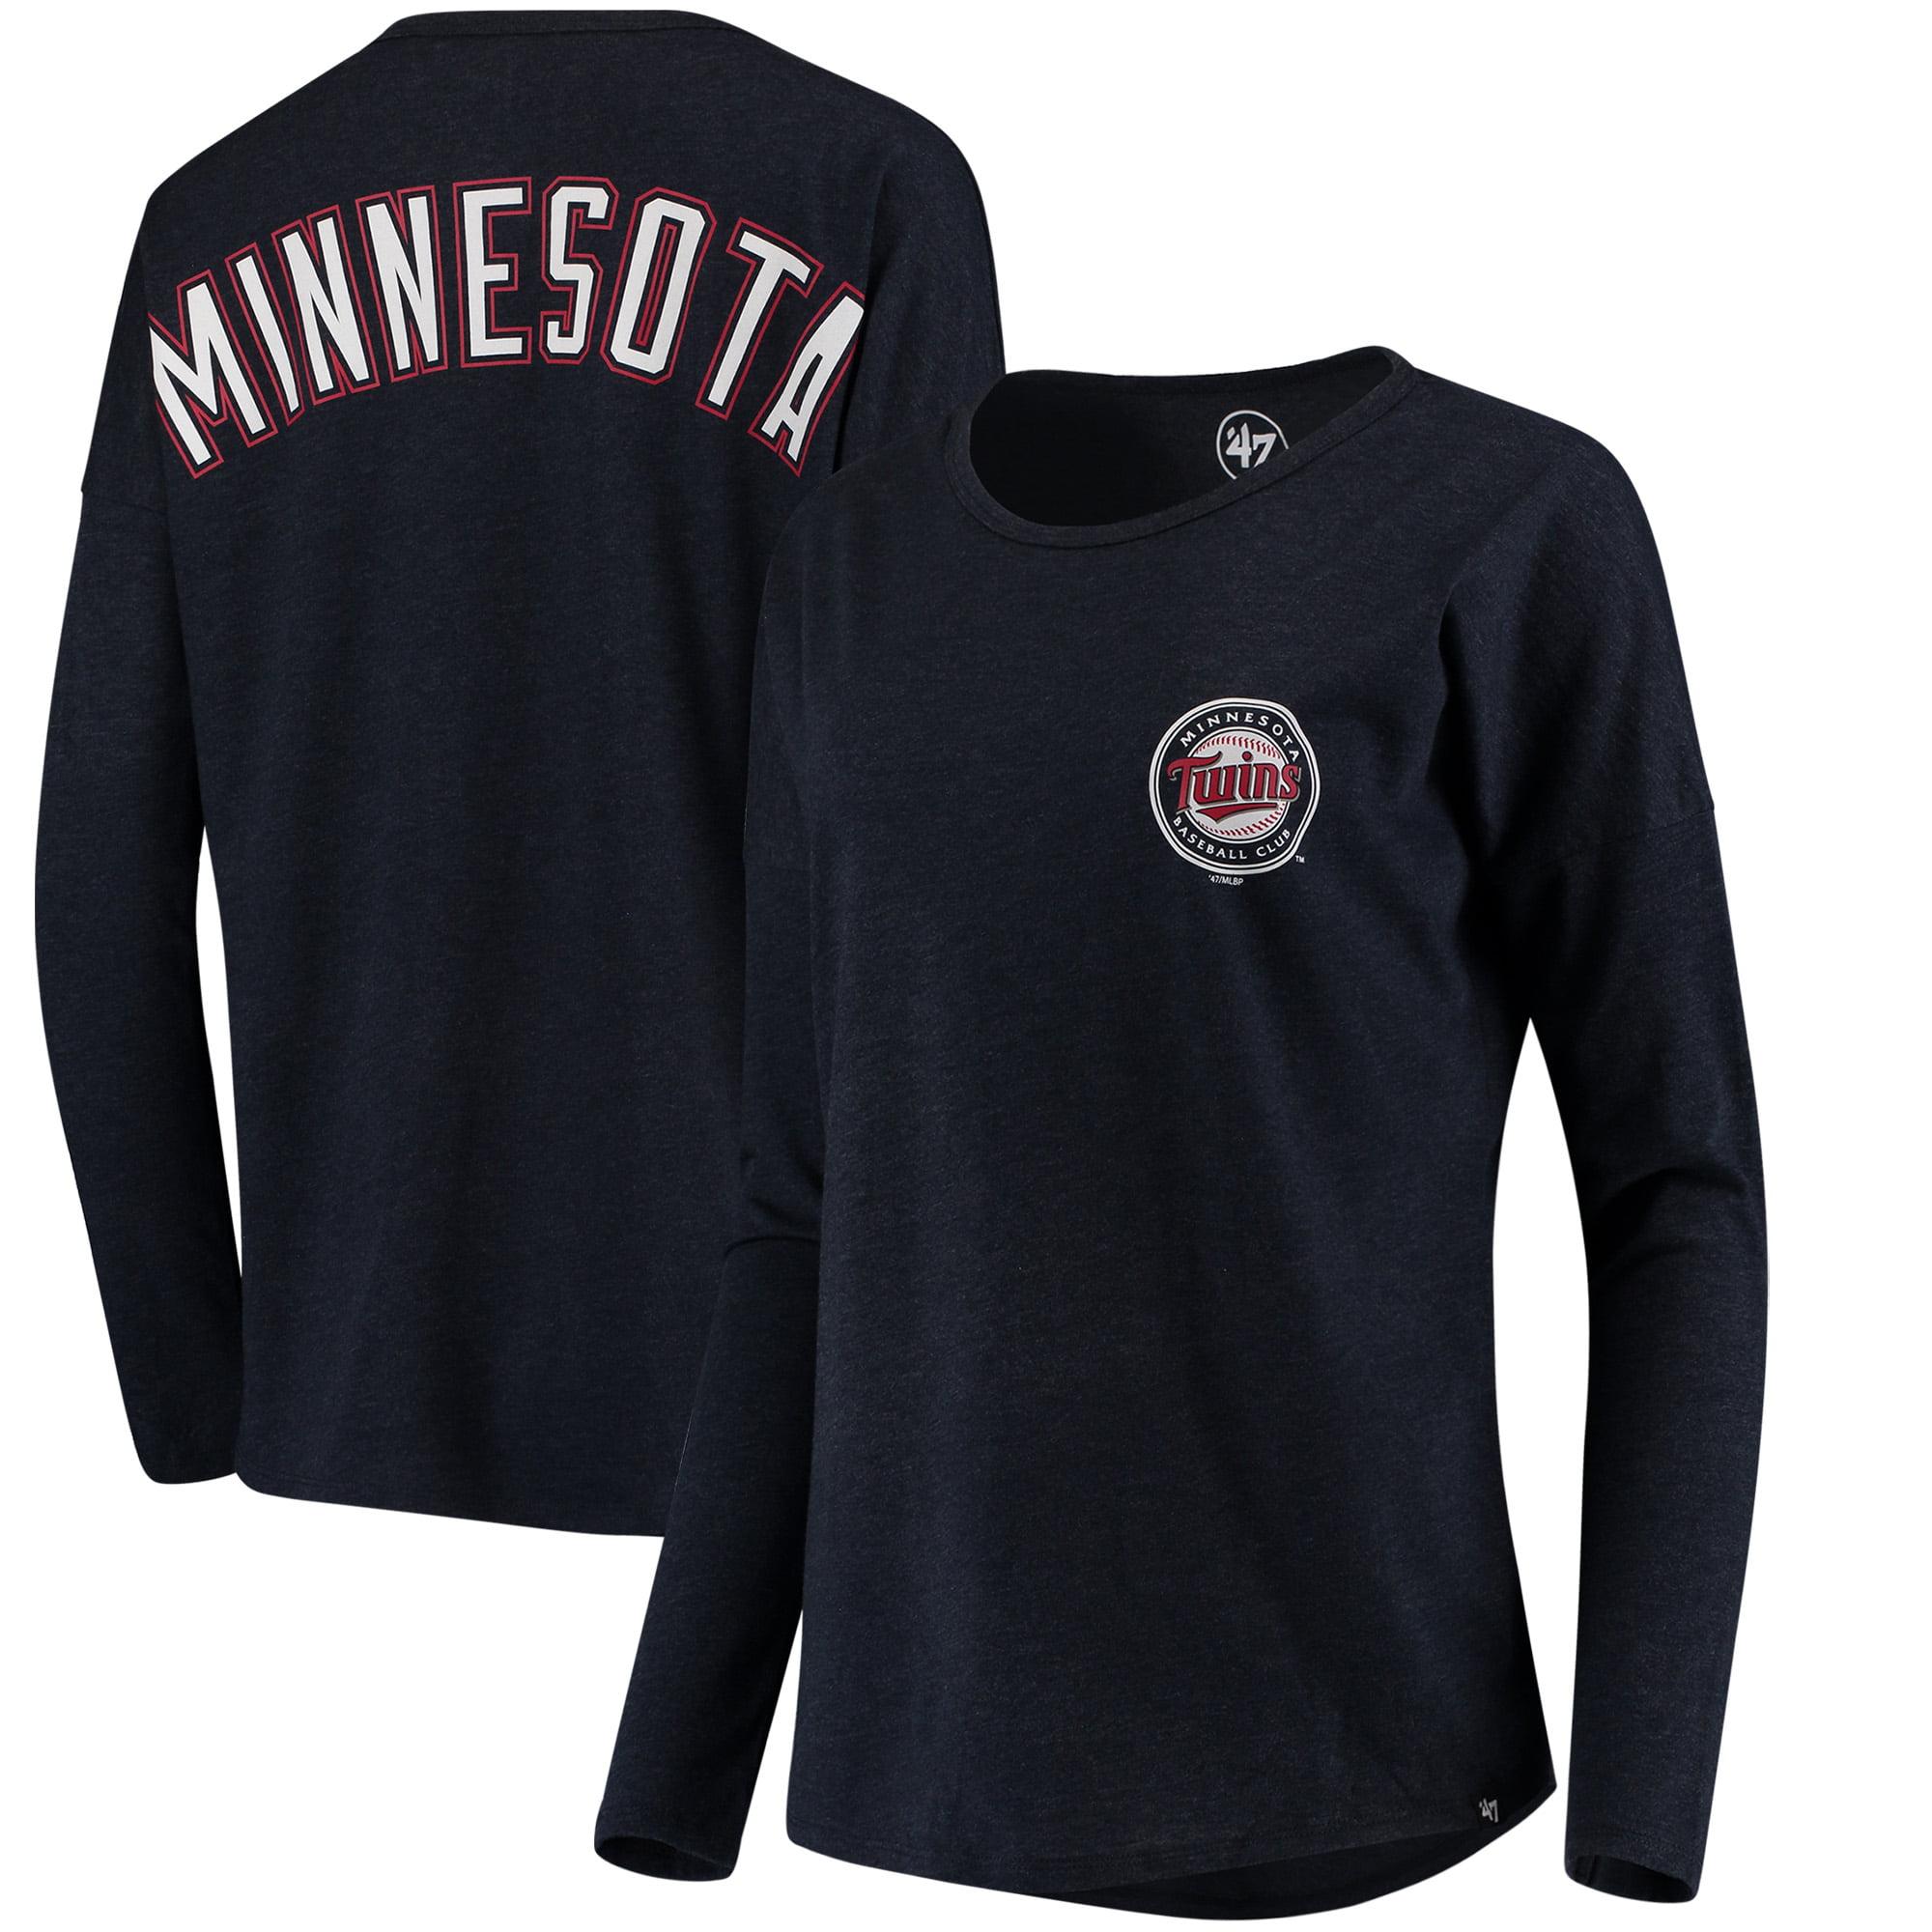 Minnesota Twins '47 Women's Courtside Long Sleeve T-Shirt - Navy